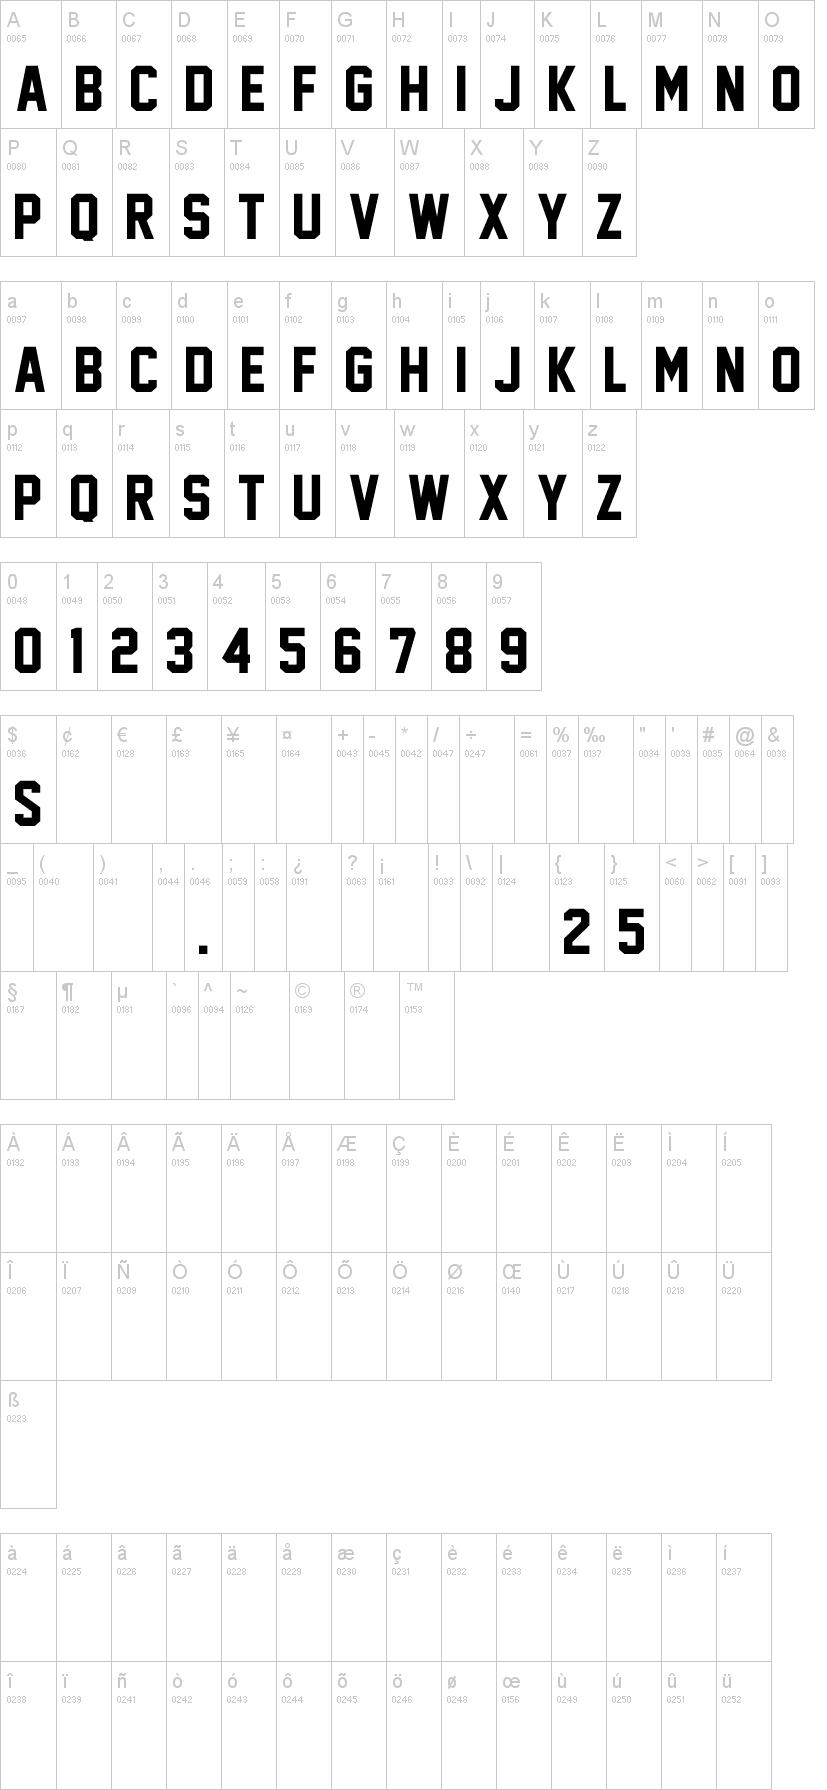 Knitting Font Dafont : New england patriots jersey number font pt sadya balawan